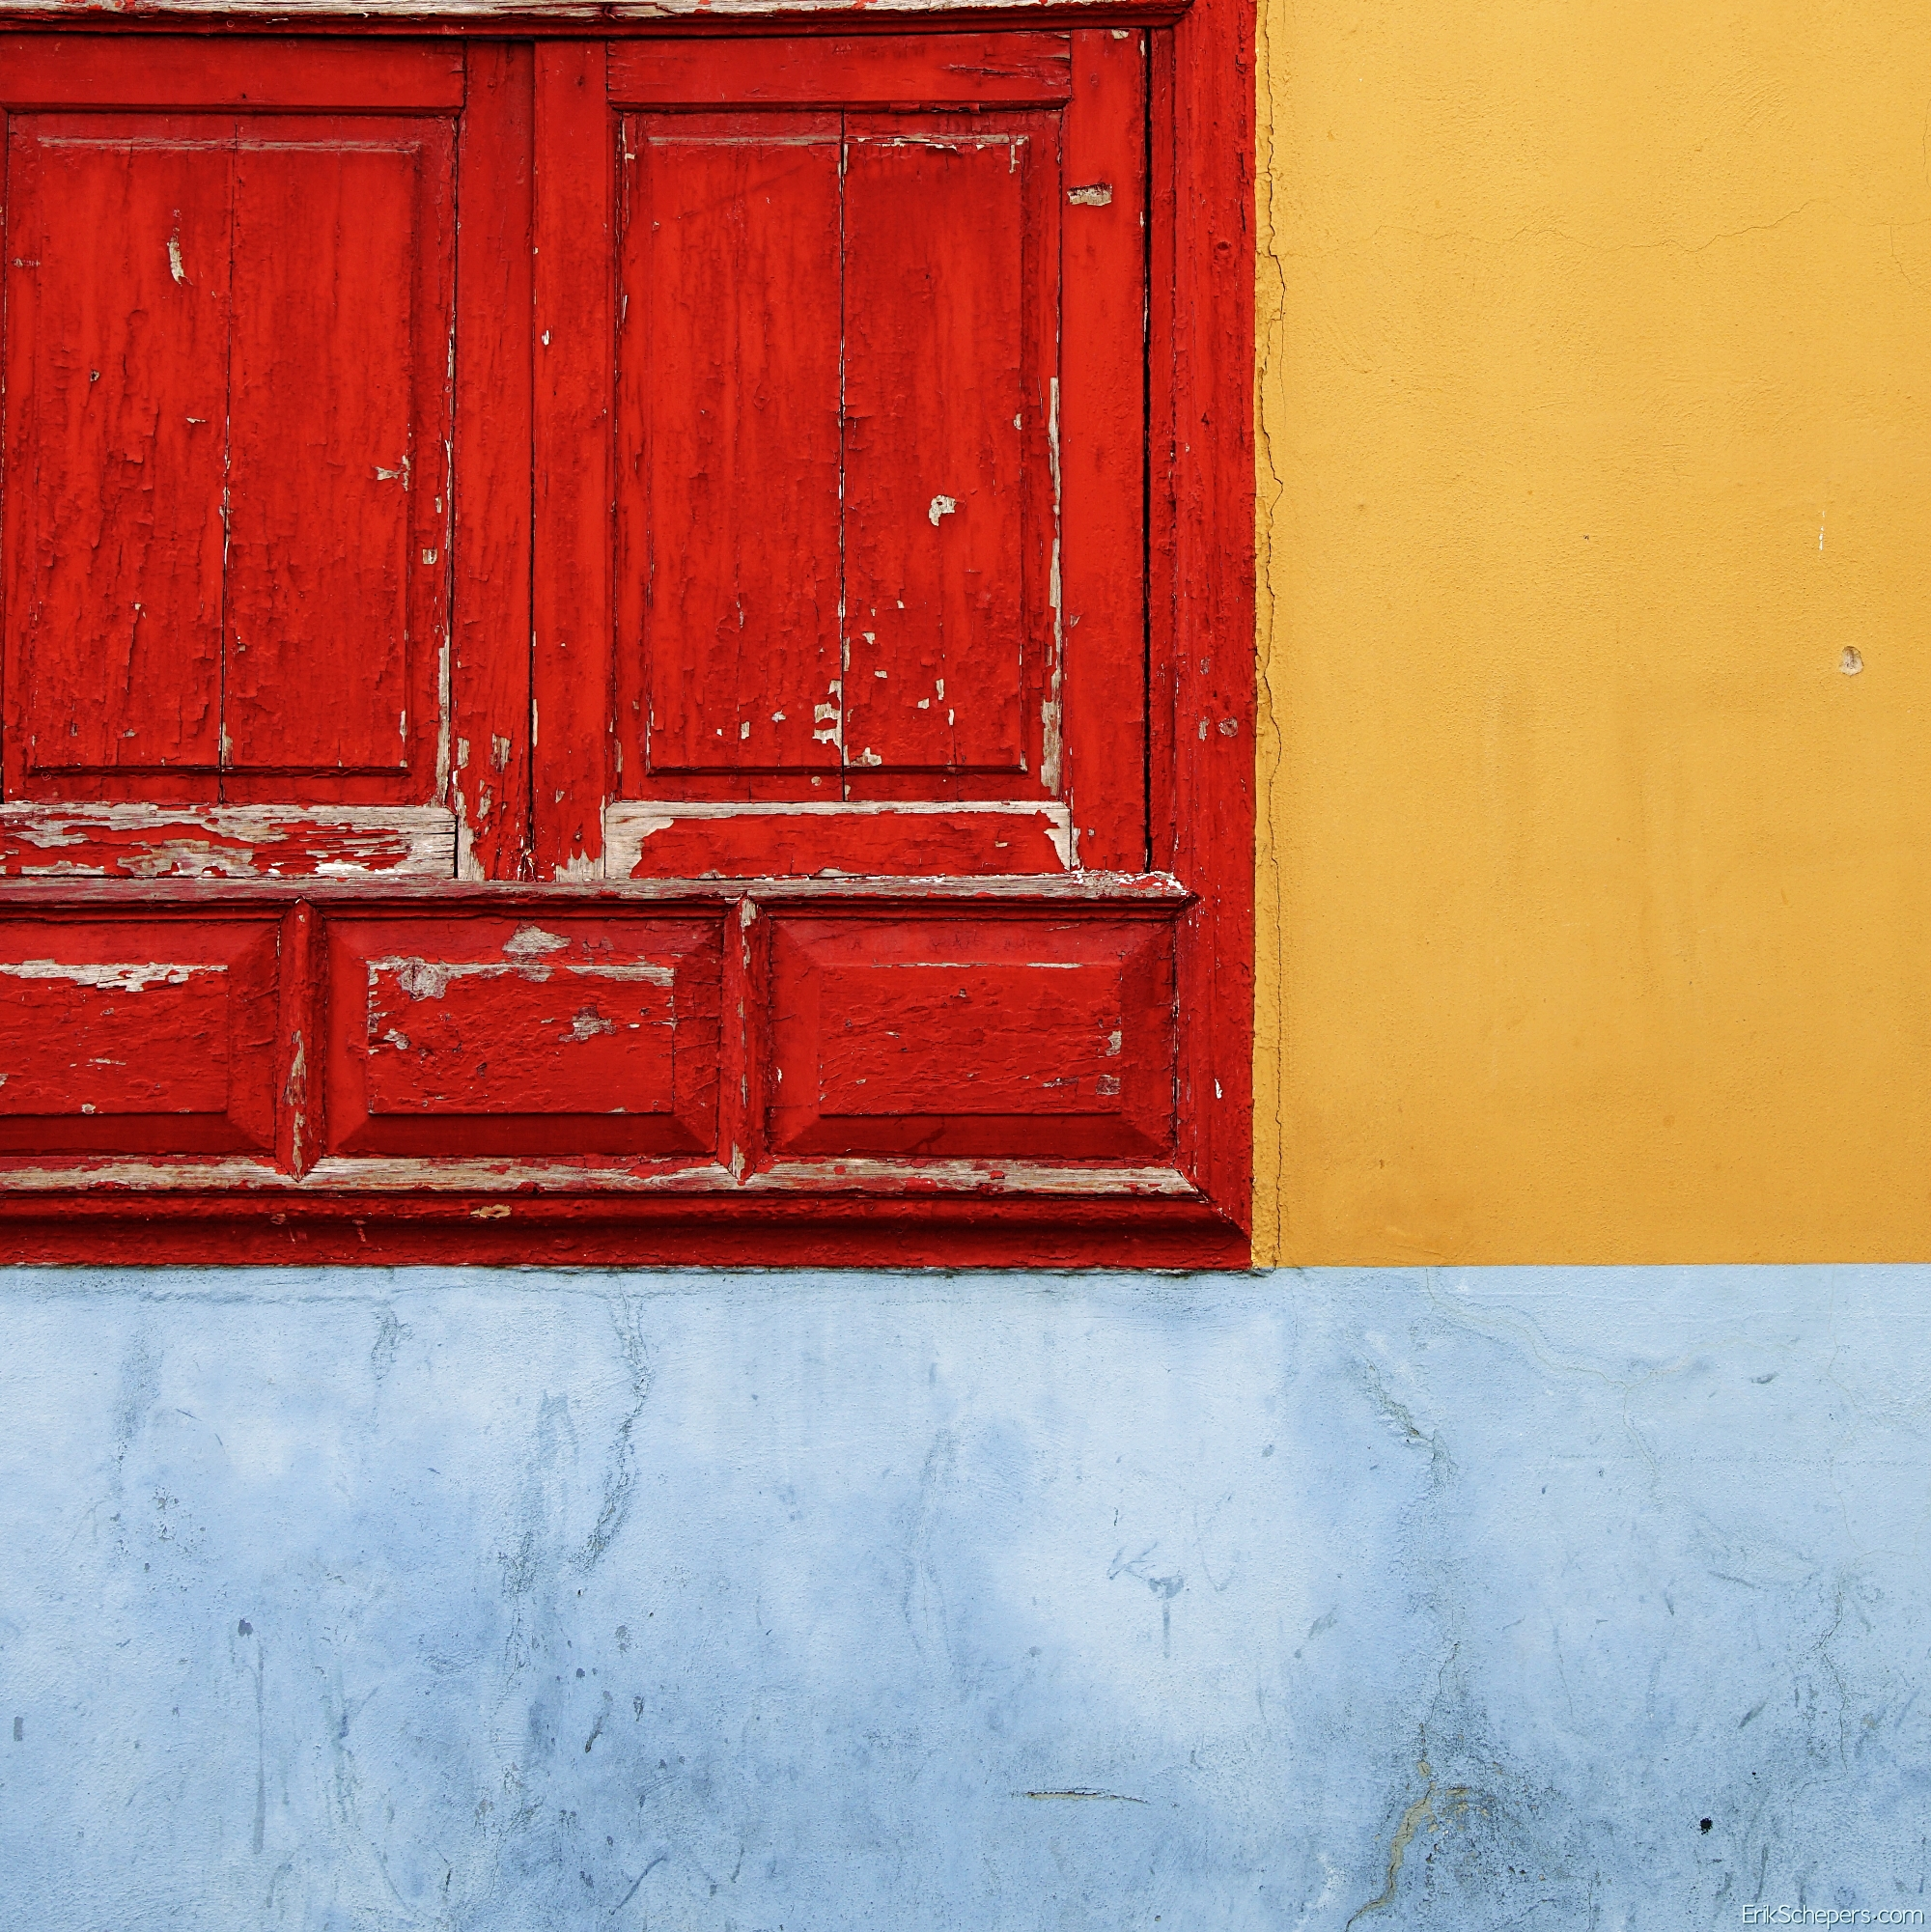 Color Tenerife, Puerto de la Cr - erik_schepers | ello